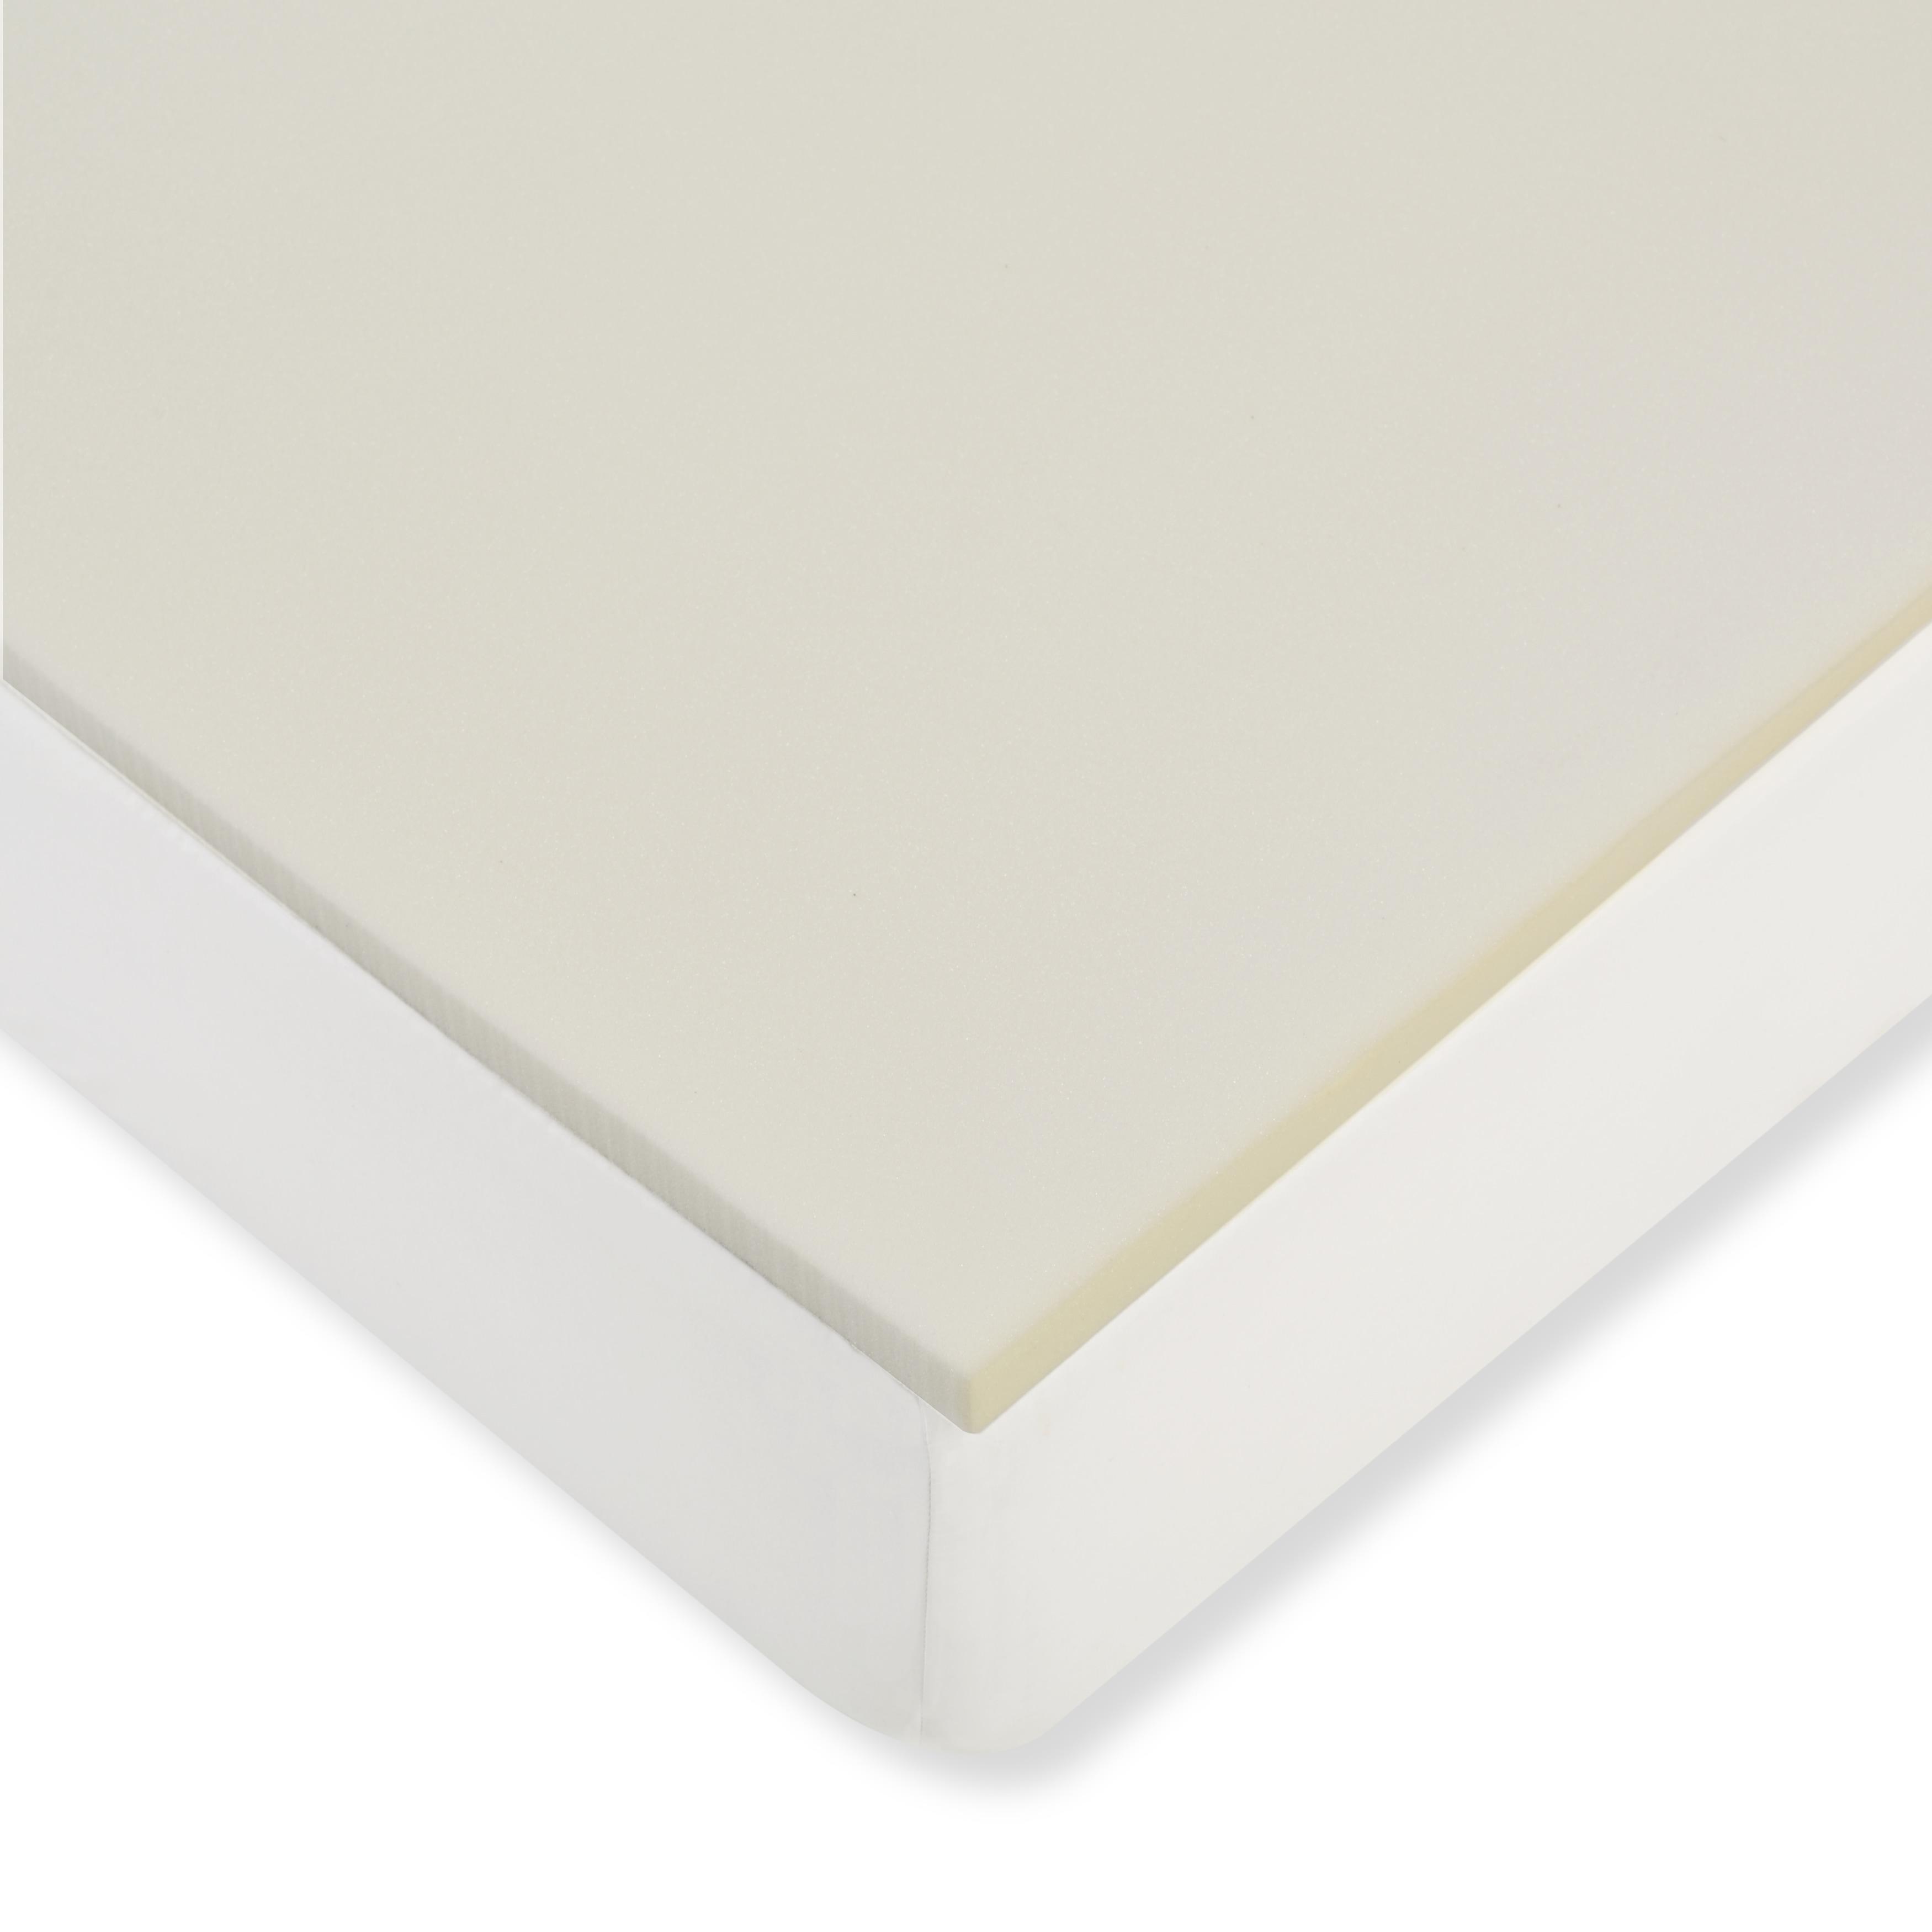 mattress toppers arabia foam topper silentnight memory products